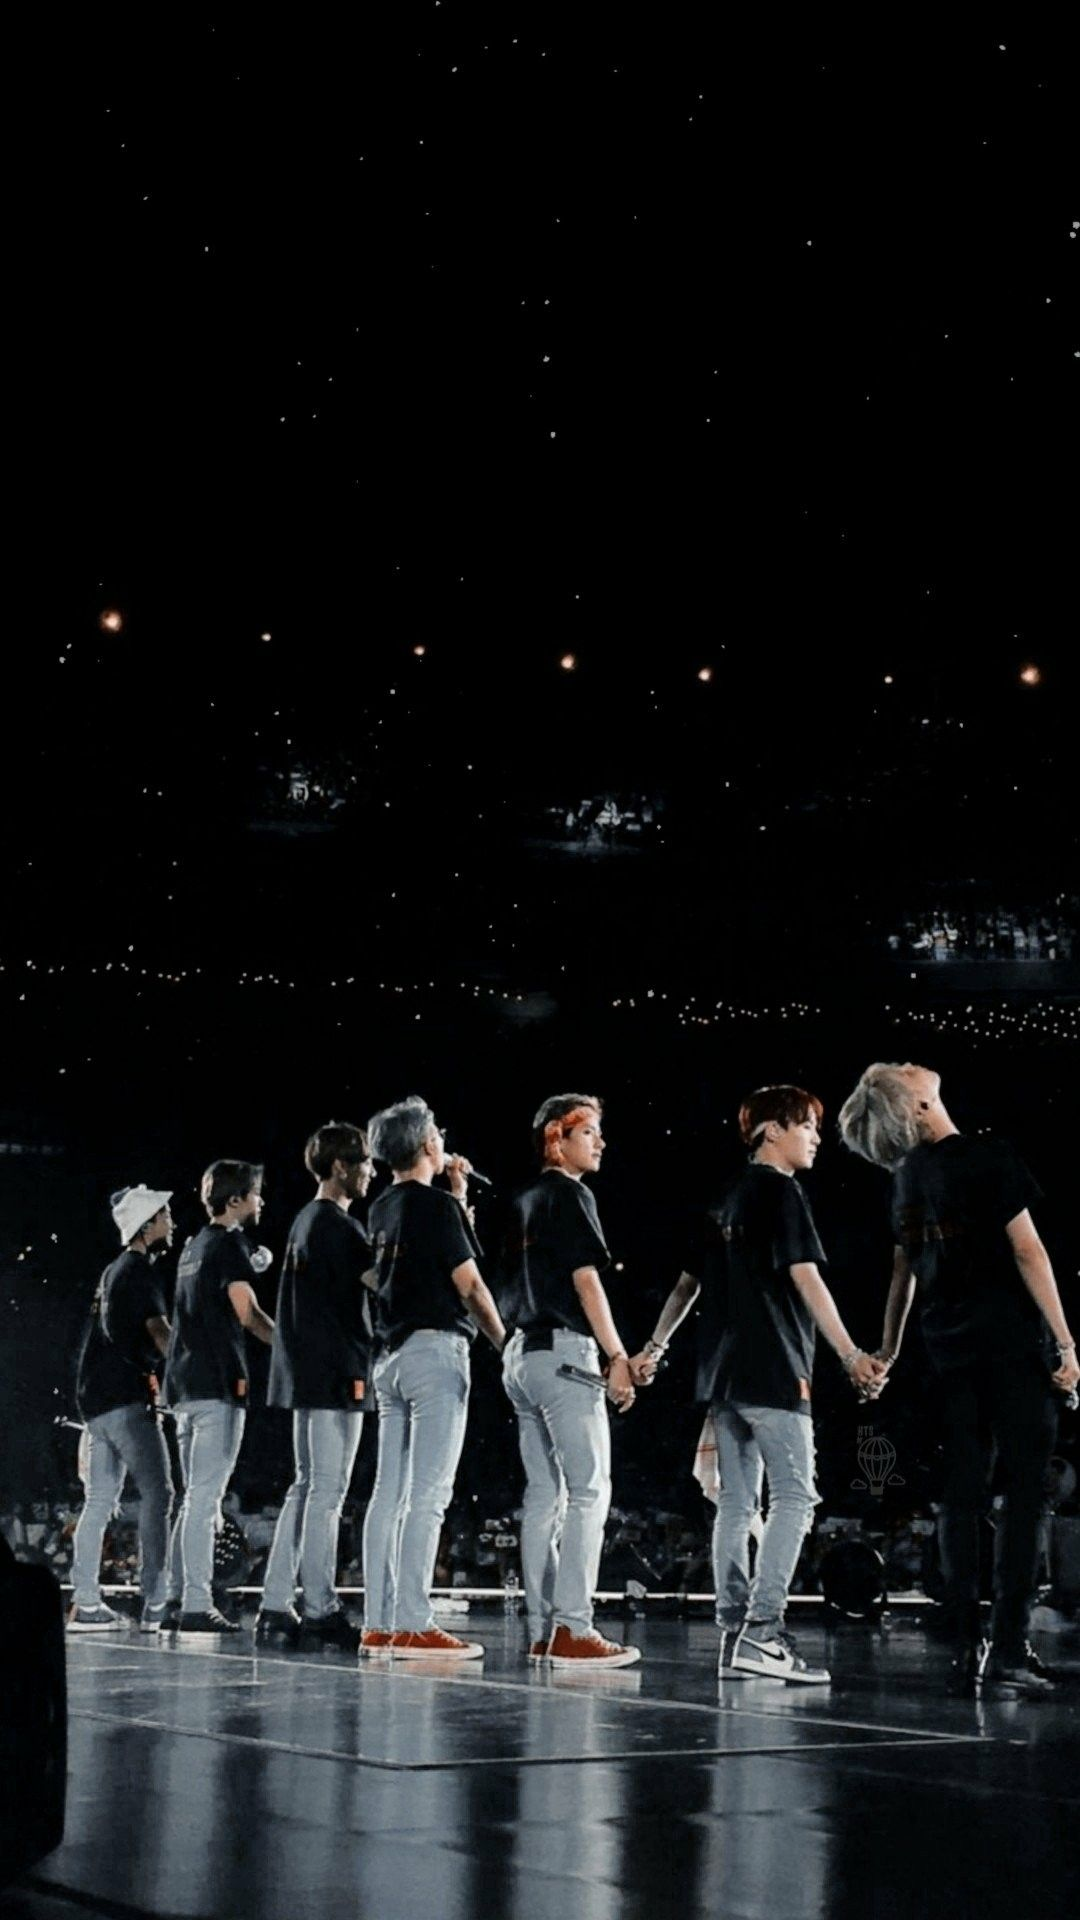 Bts Wallpapers Bts Wallpaper Bts Concert Bts Photo Bts wallpaper on stage